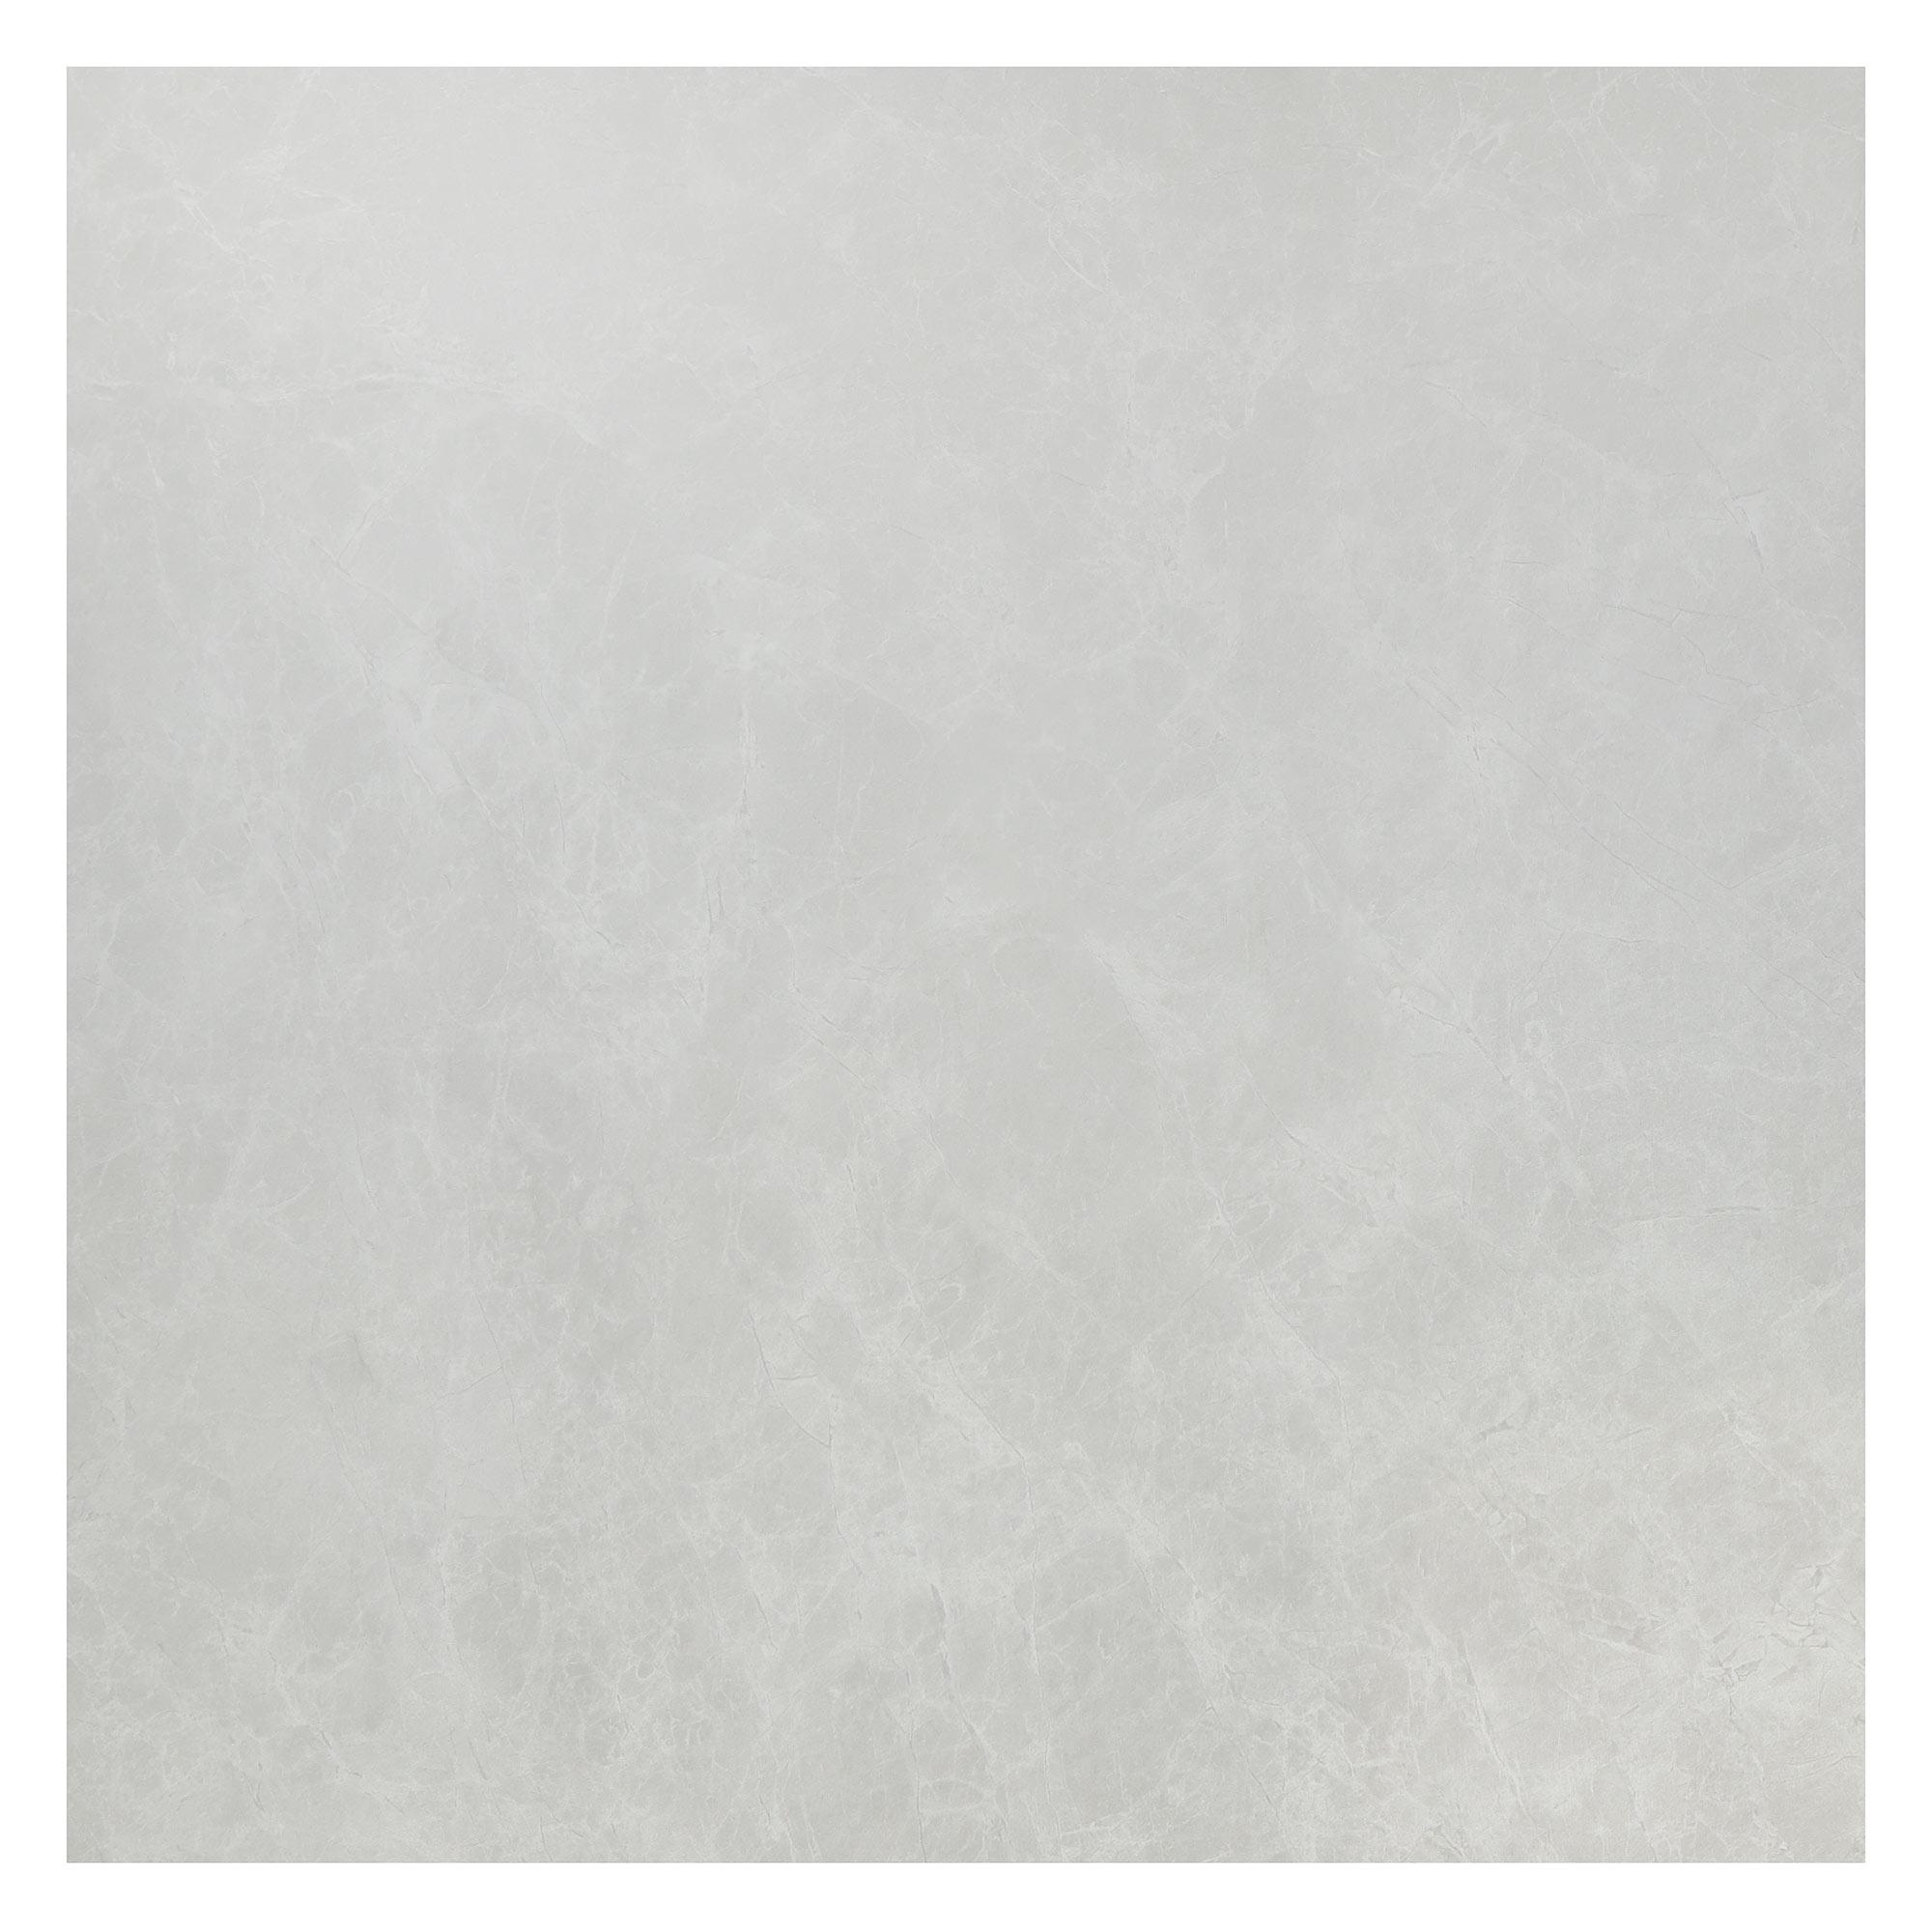 Фото - Плитка напольная Cristacer Capitolina Ash 59,2х59,2 см плитка напольная cristacer avenue grey gr 59 2х59 2